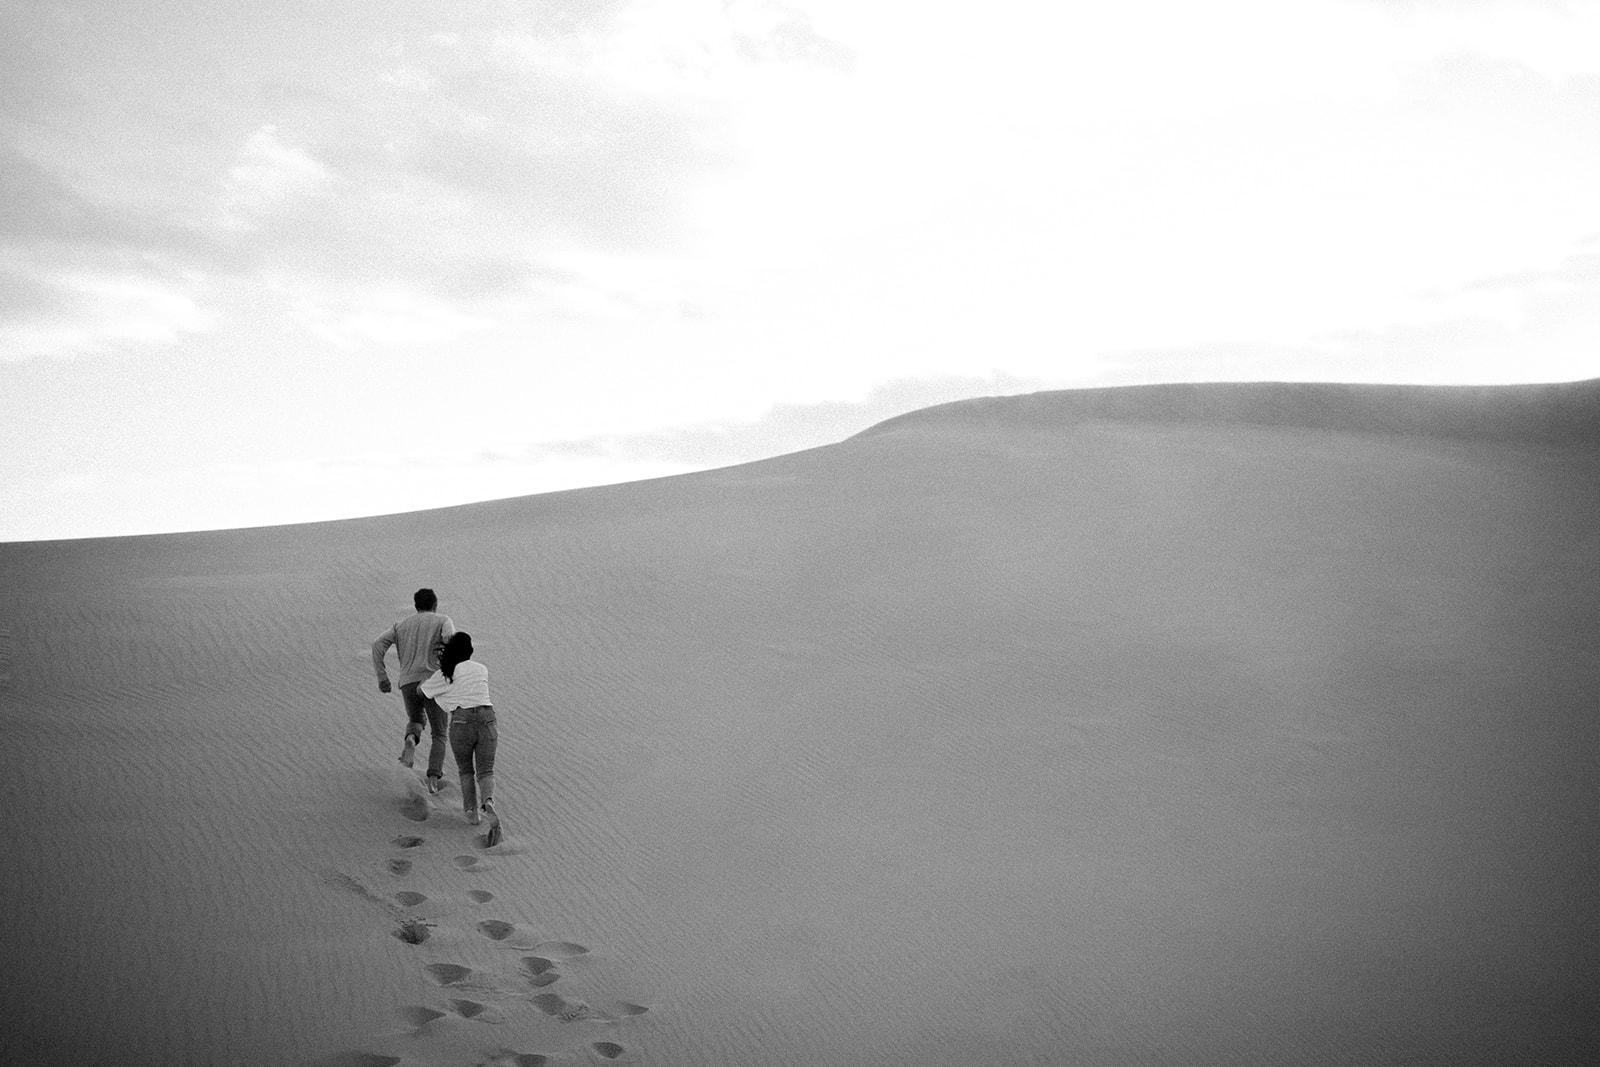 Imperial_Sand_Dunes_Linda_and_Sam_Dawn_Charles_Photographer-84.jpg